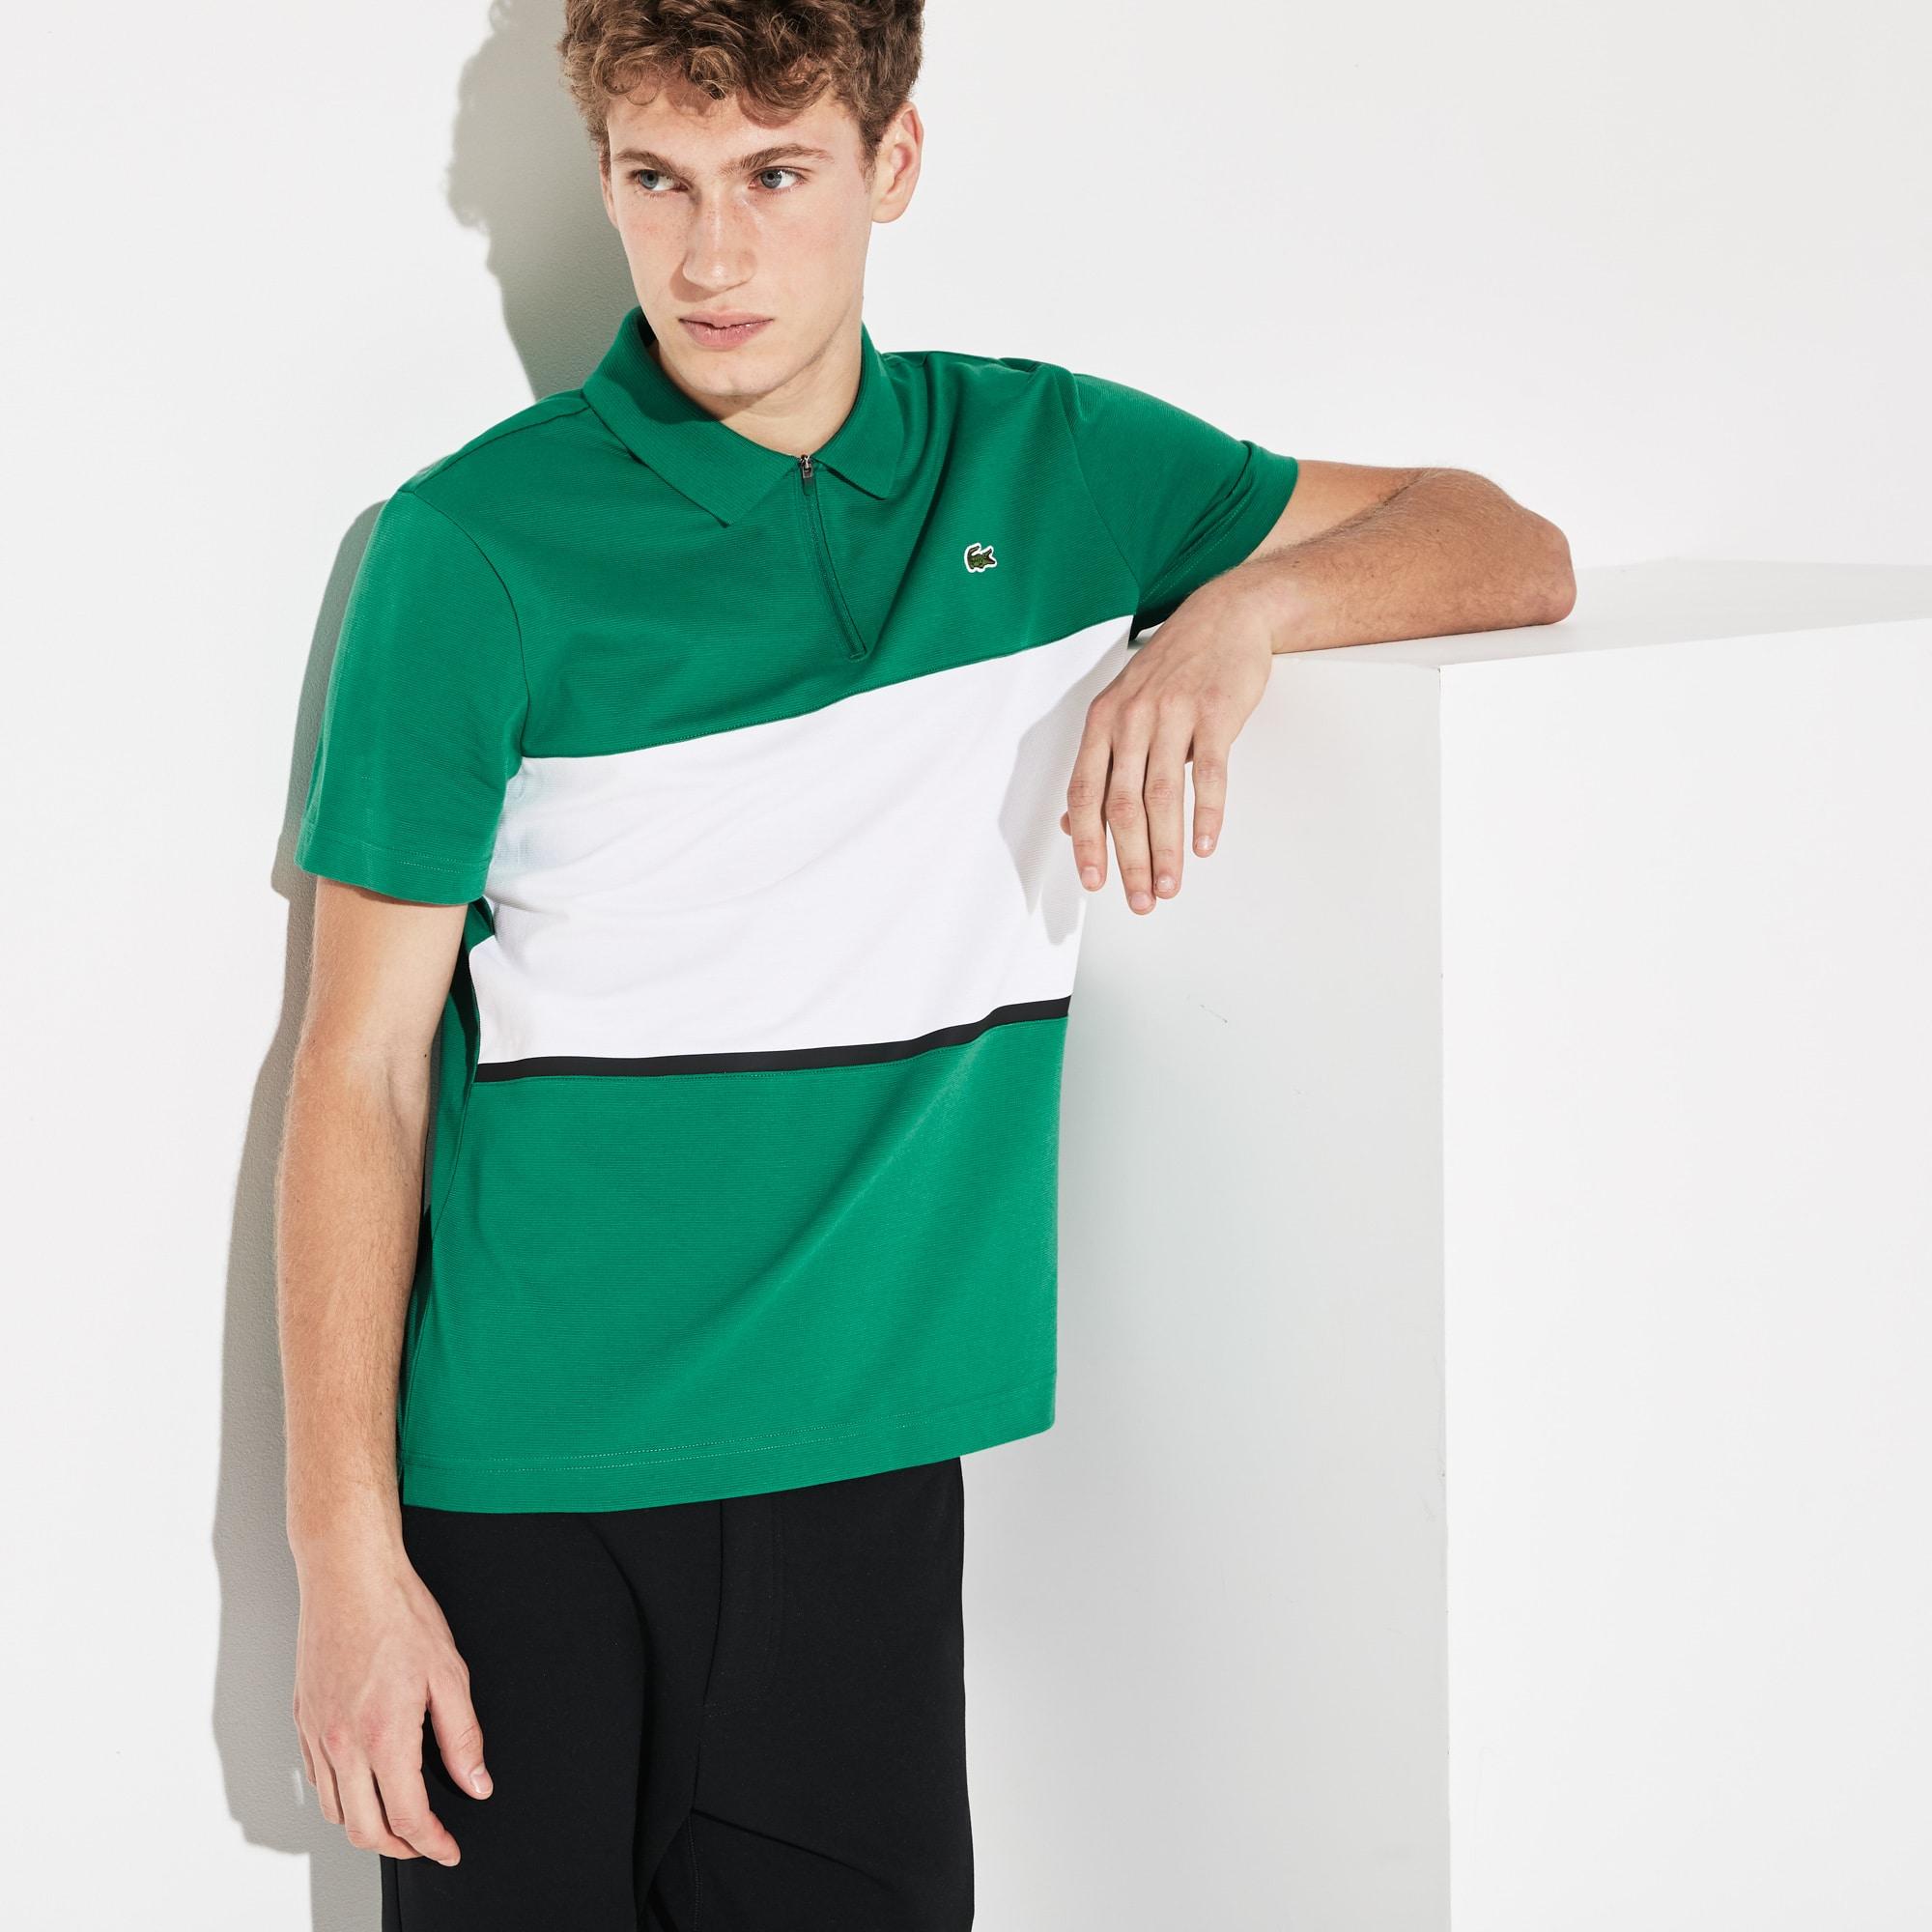 f286bd209 Men s Lacoste SPORT Zip Neck Colourblock Ultra Light Cotton Polo ...